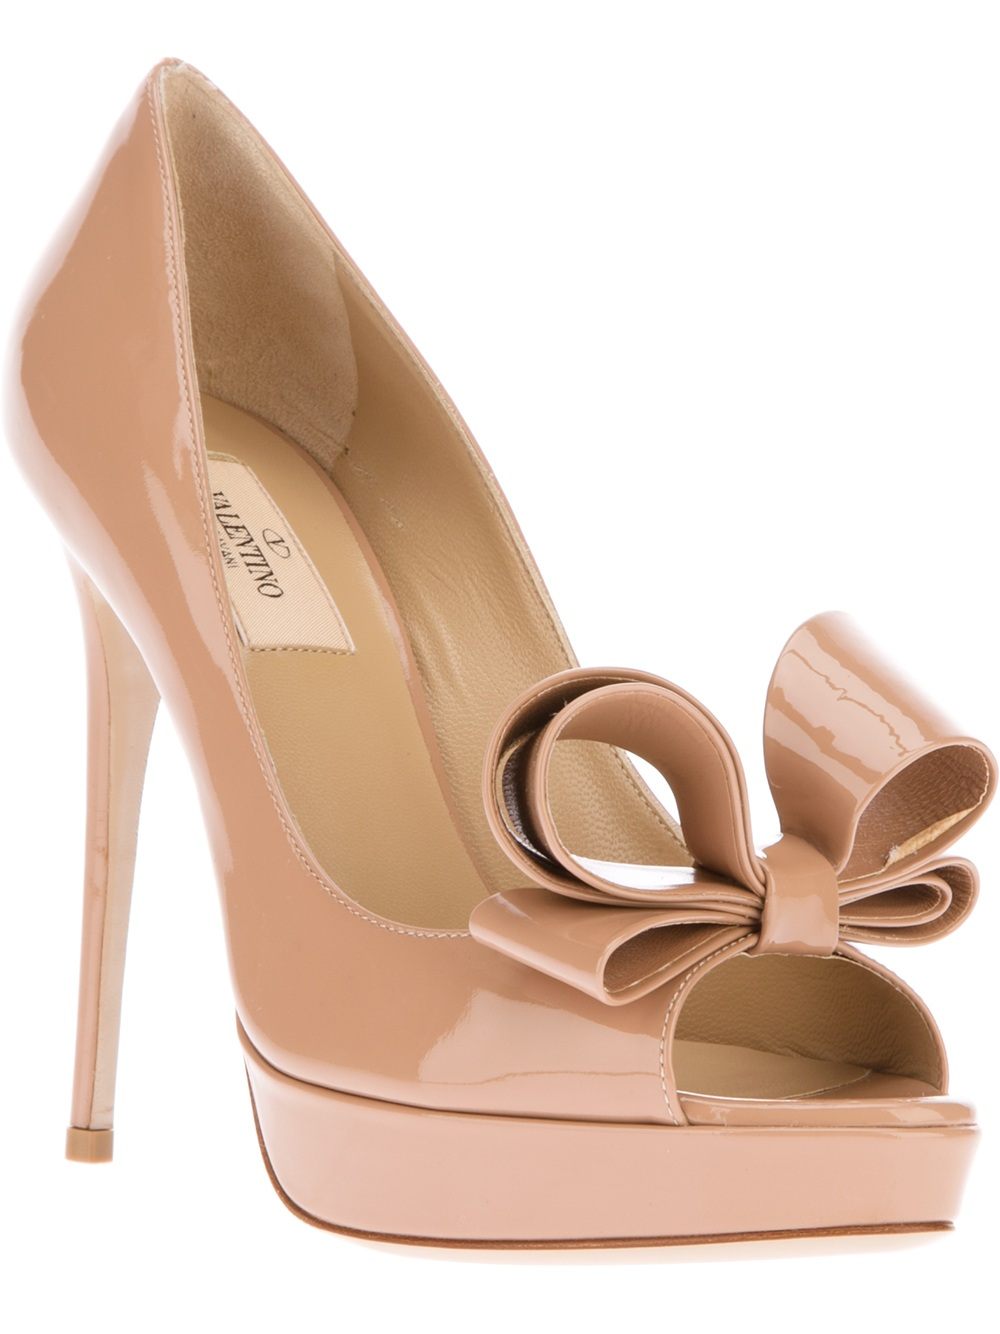 Valentino Peep Toe Pump in Rose